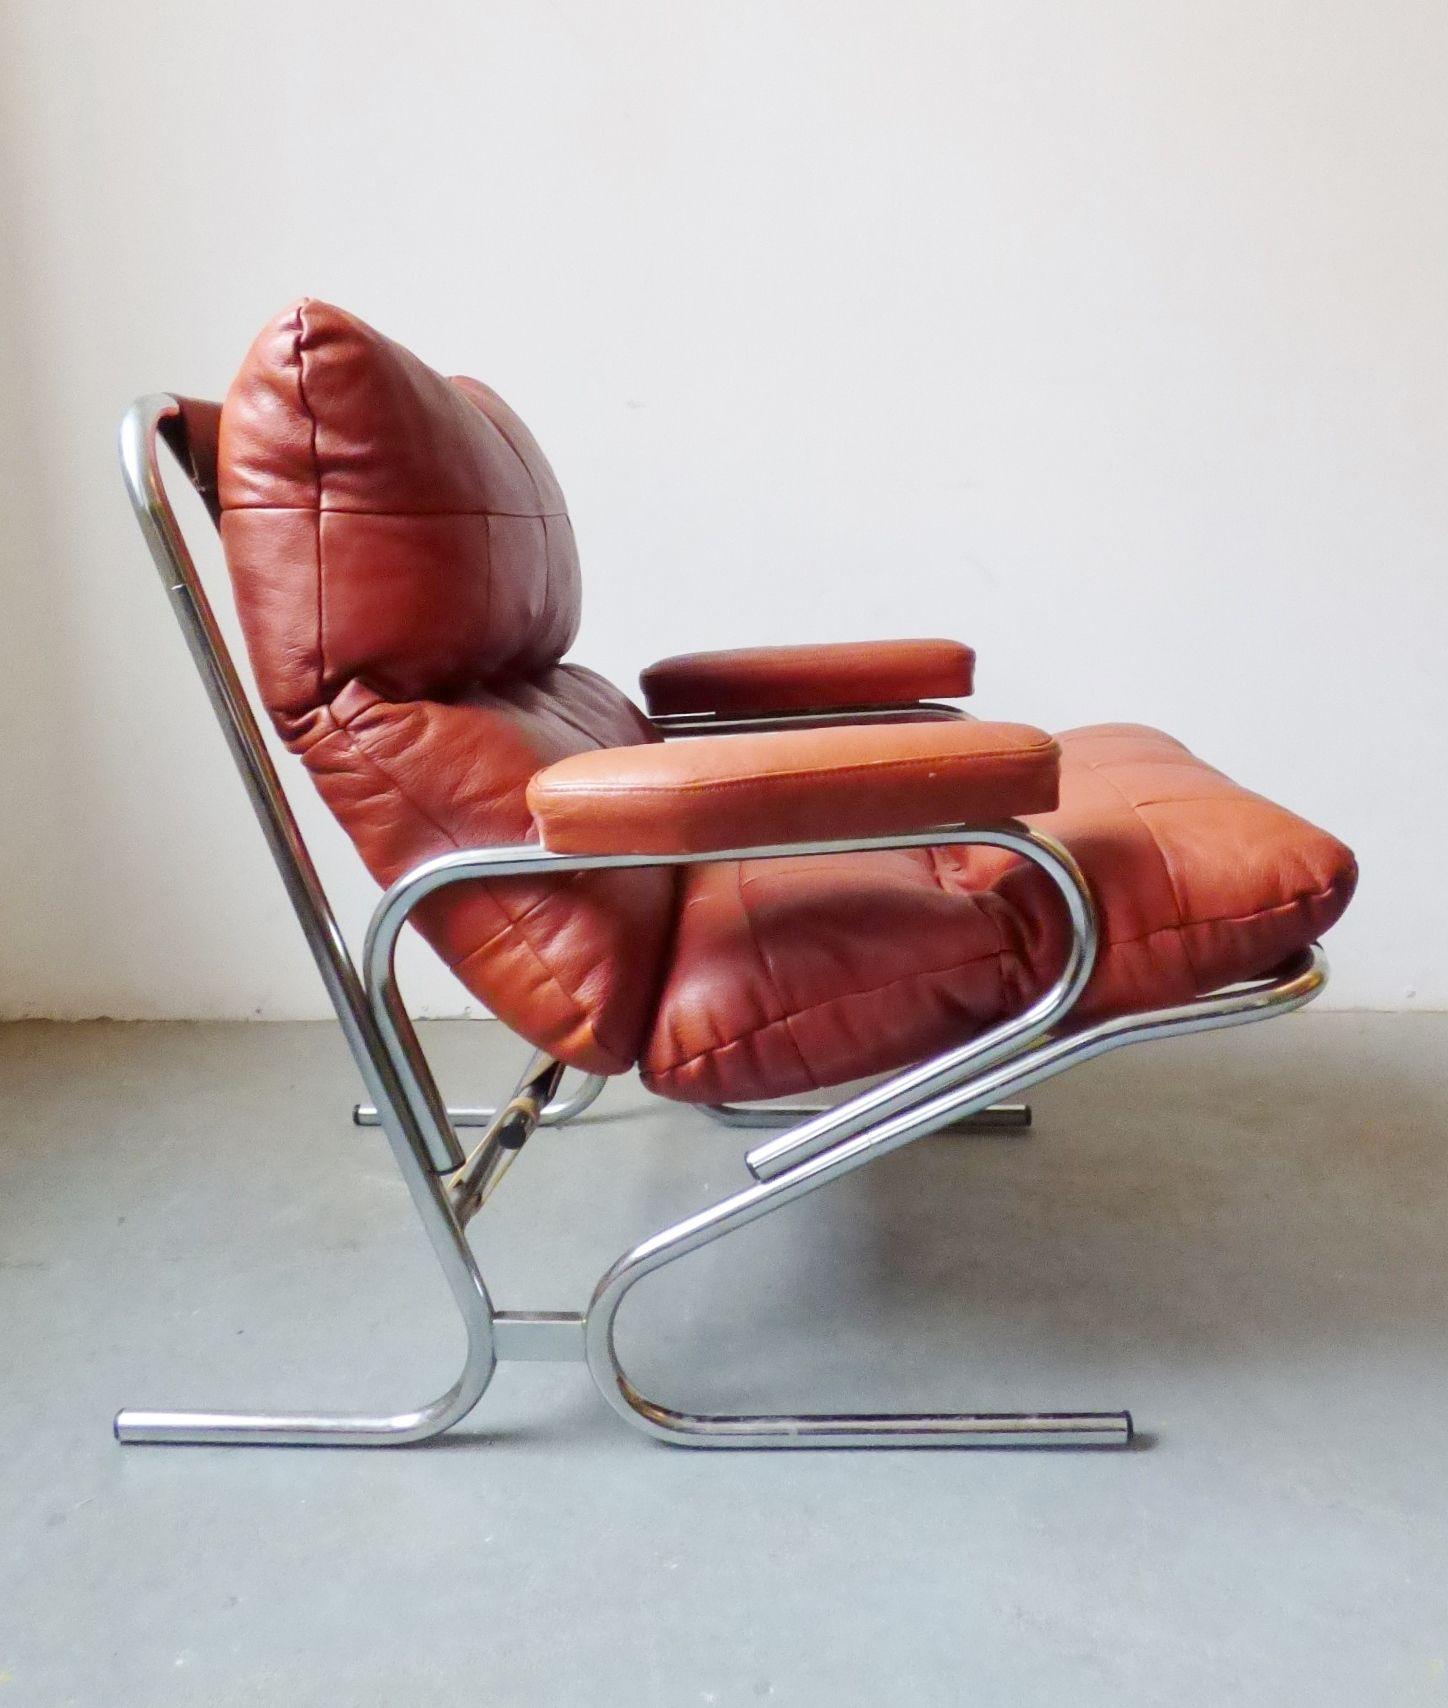 1960s Danish Chrome And Leather Armchair By Skipper Furniture Leather Armchair Mid Century Furniture Chrome Chair